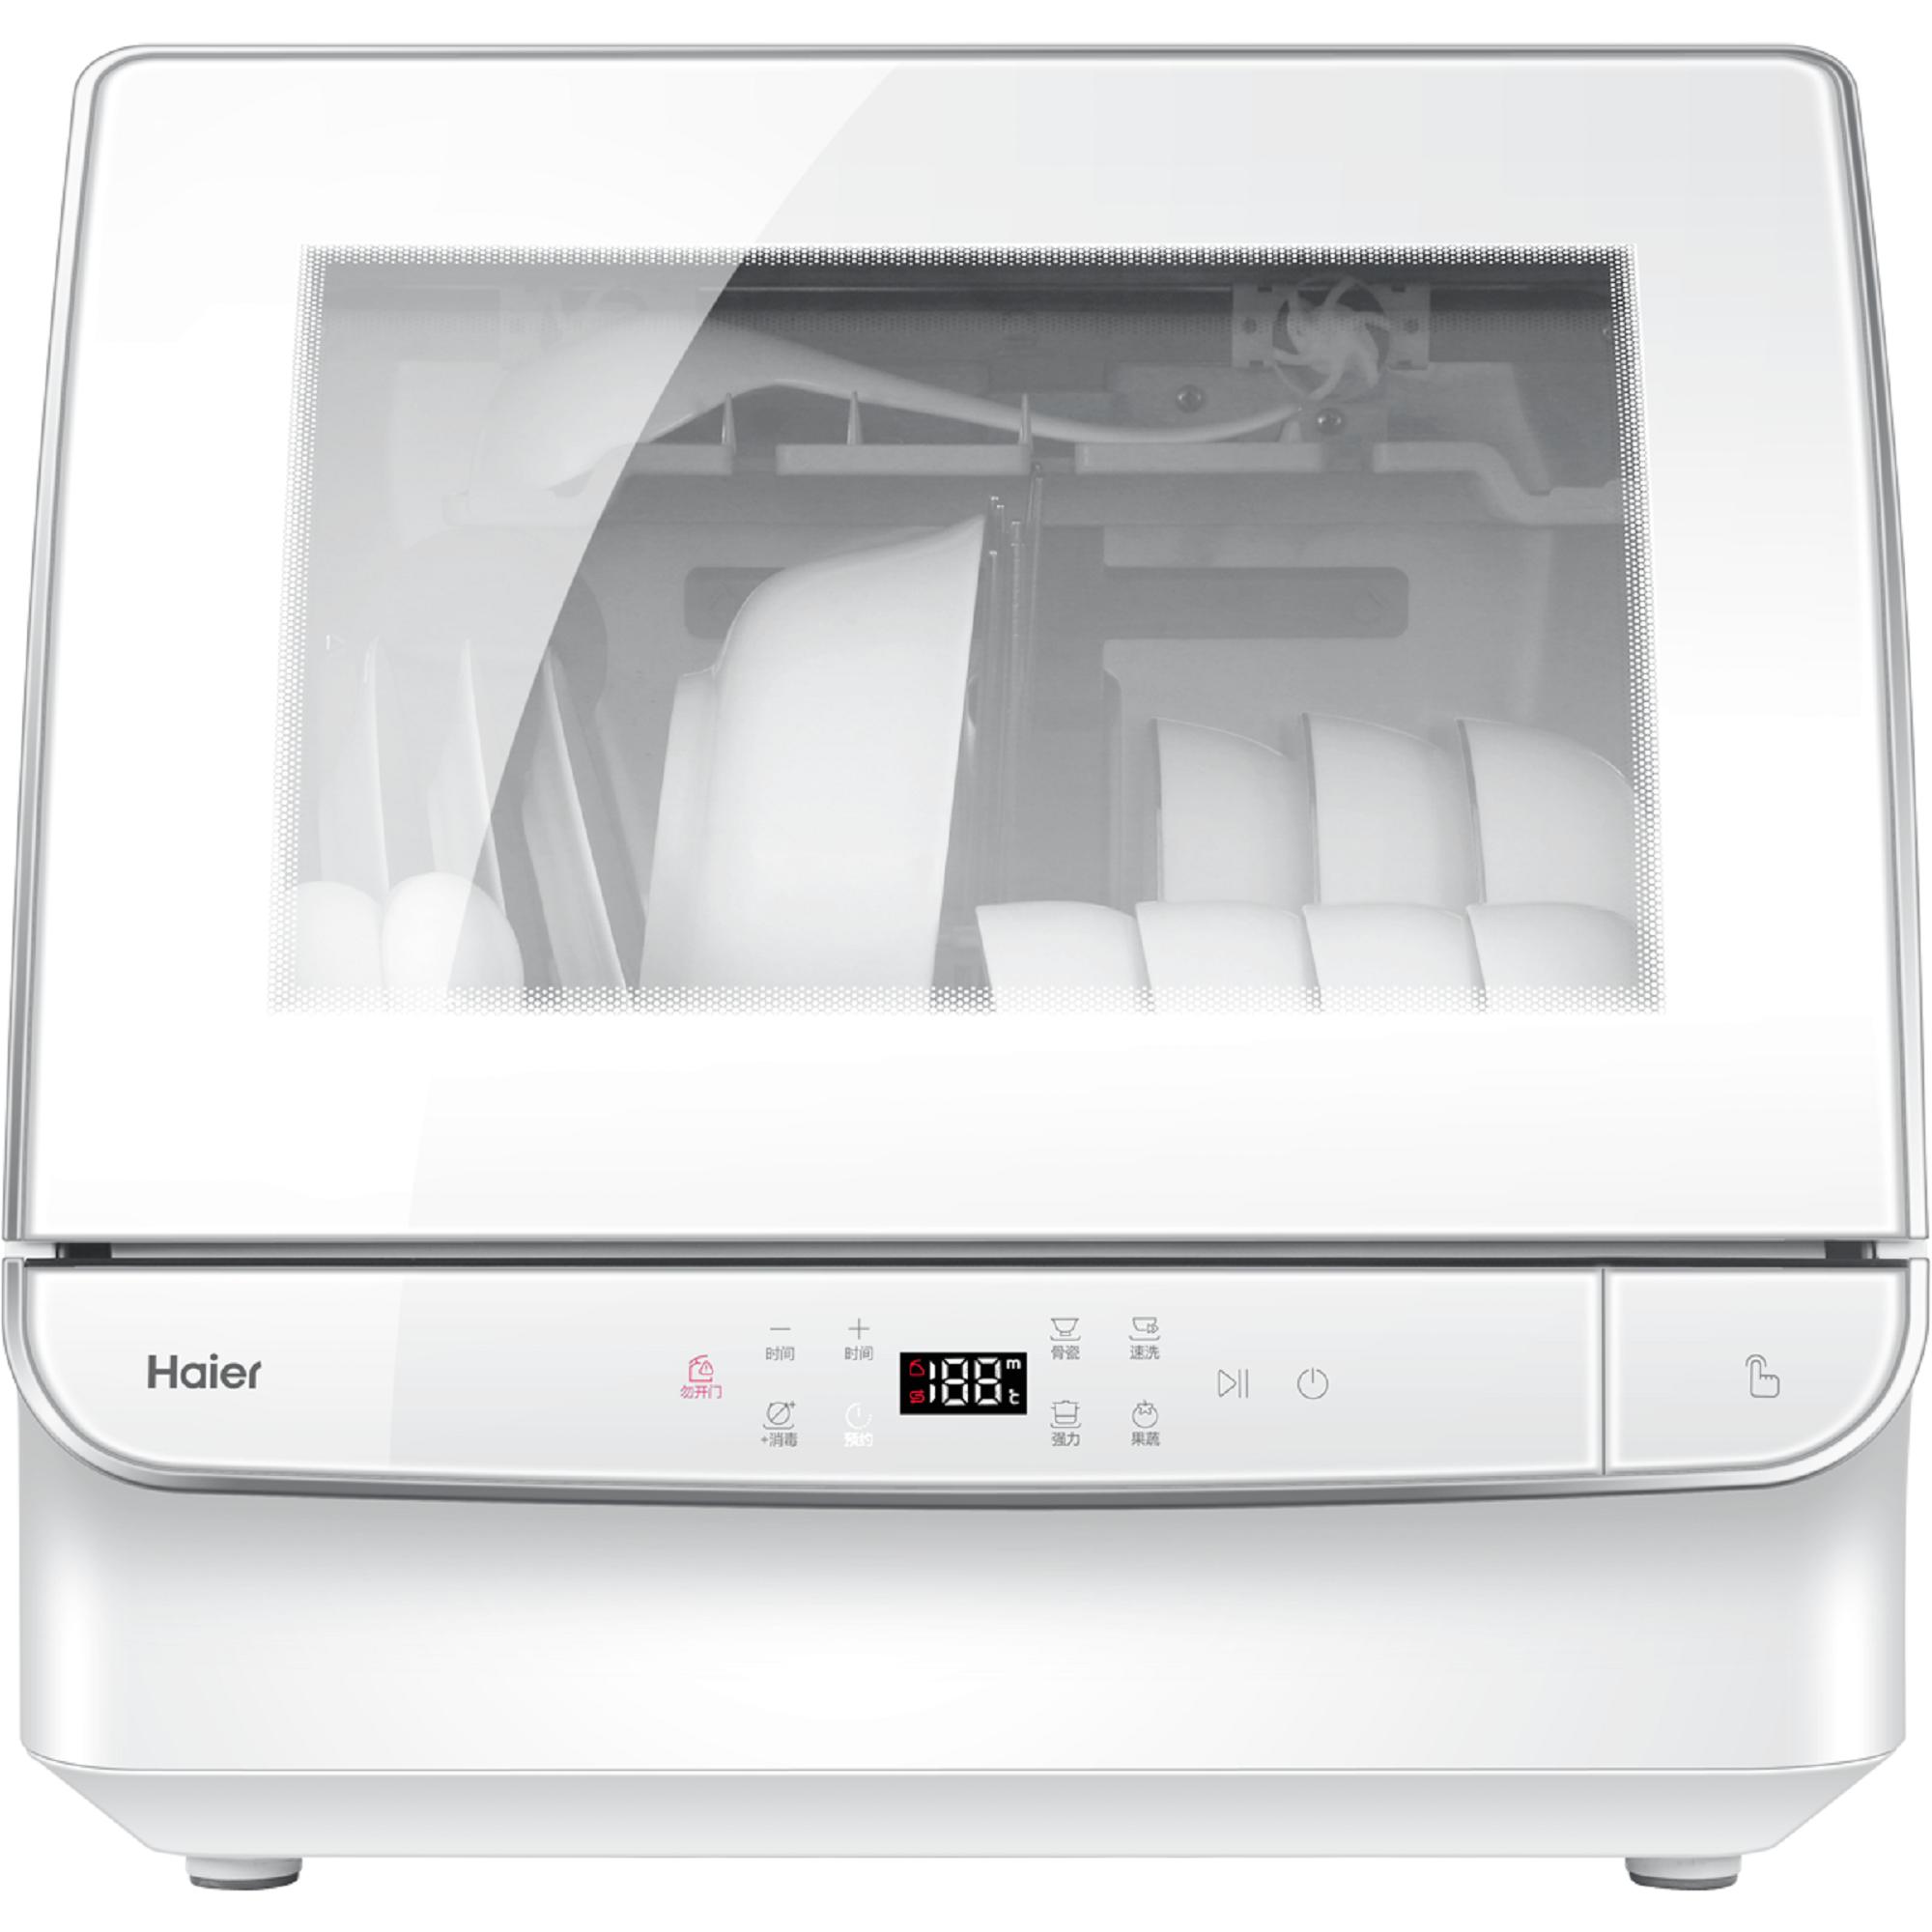 中式洗碗机HTAW50STGW